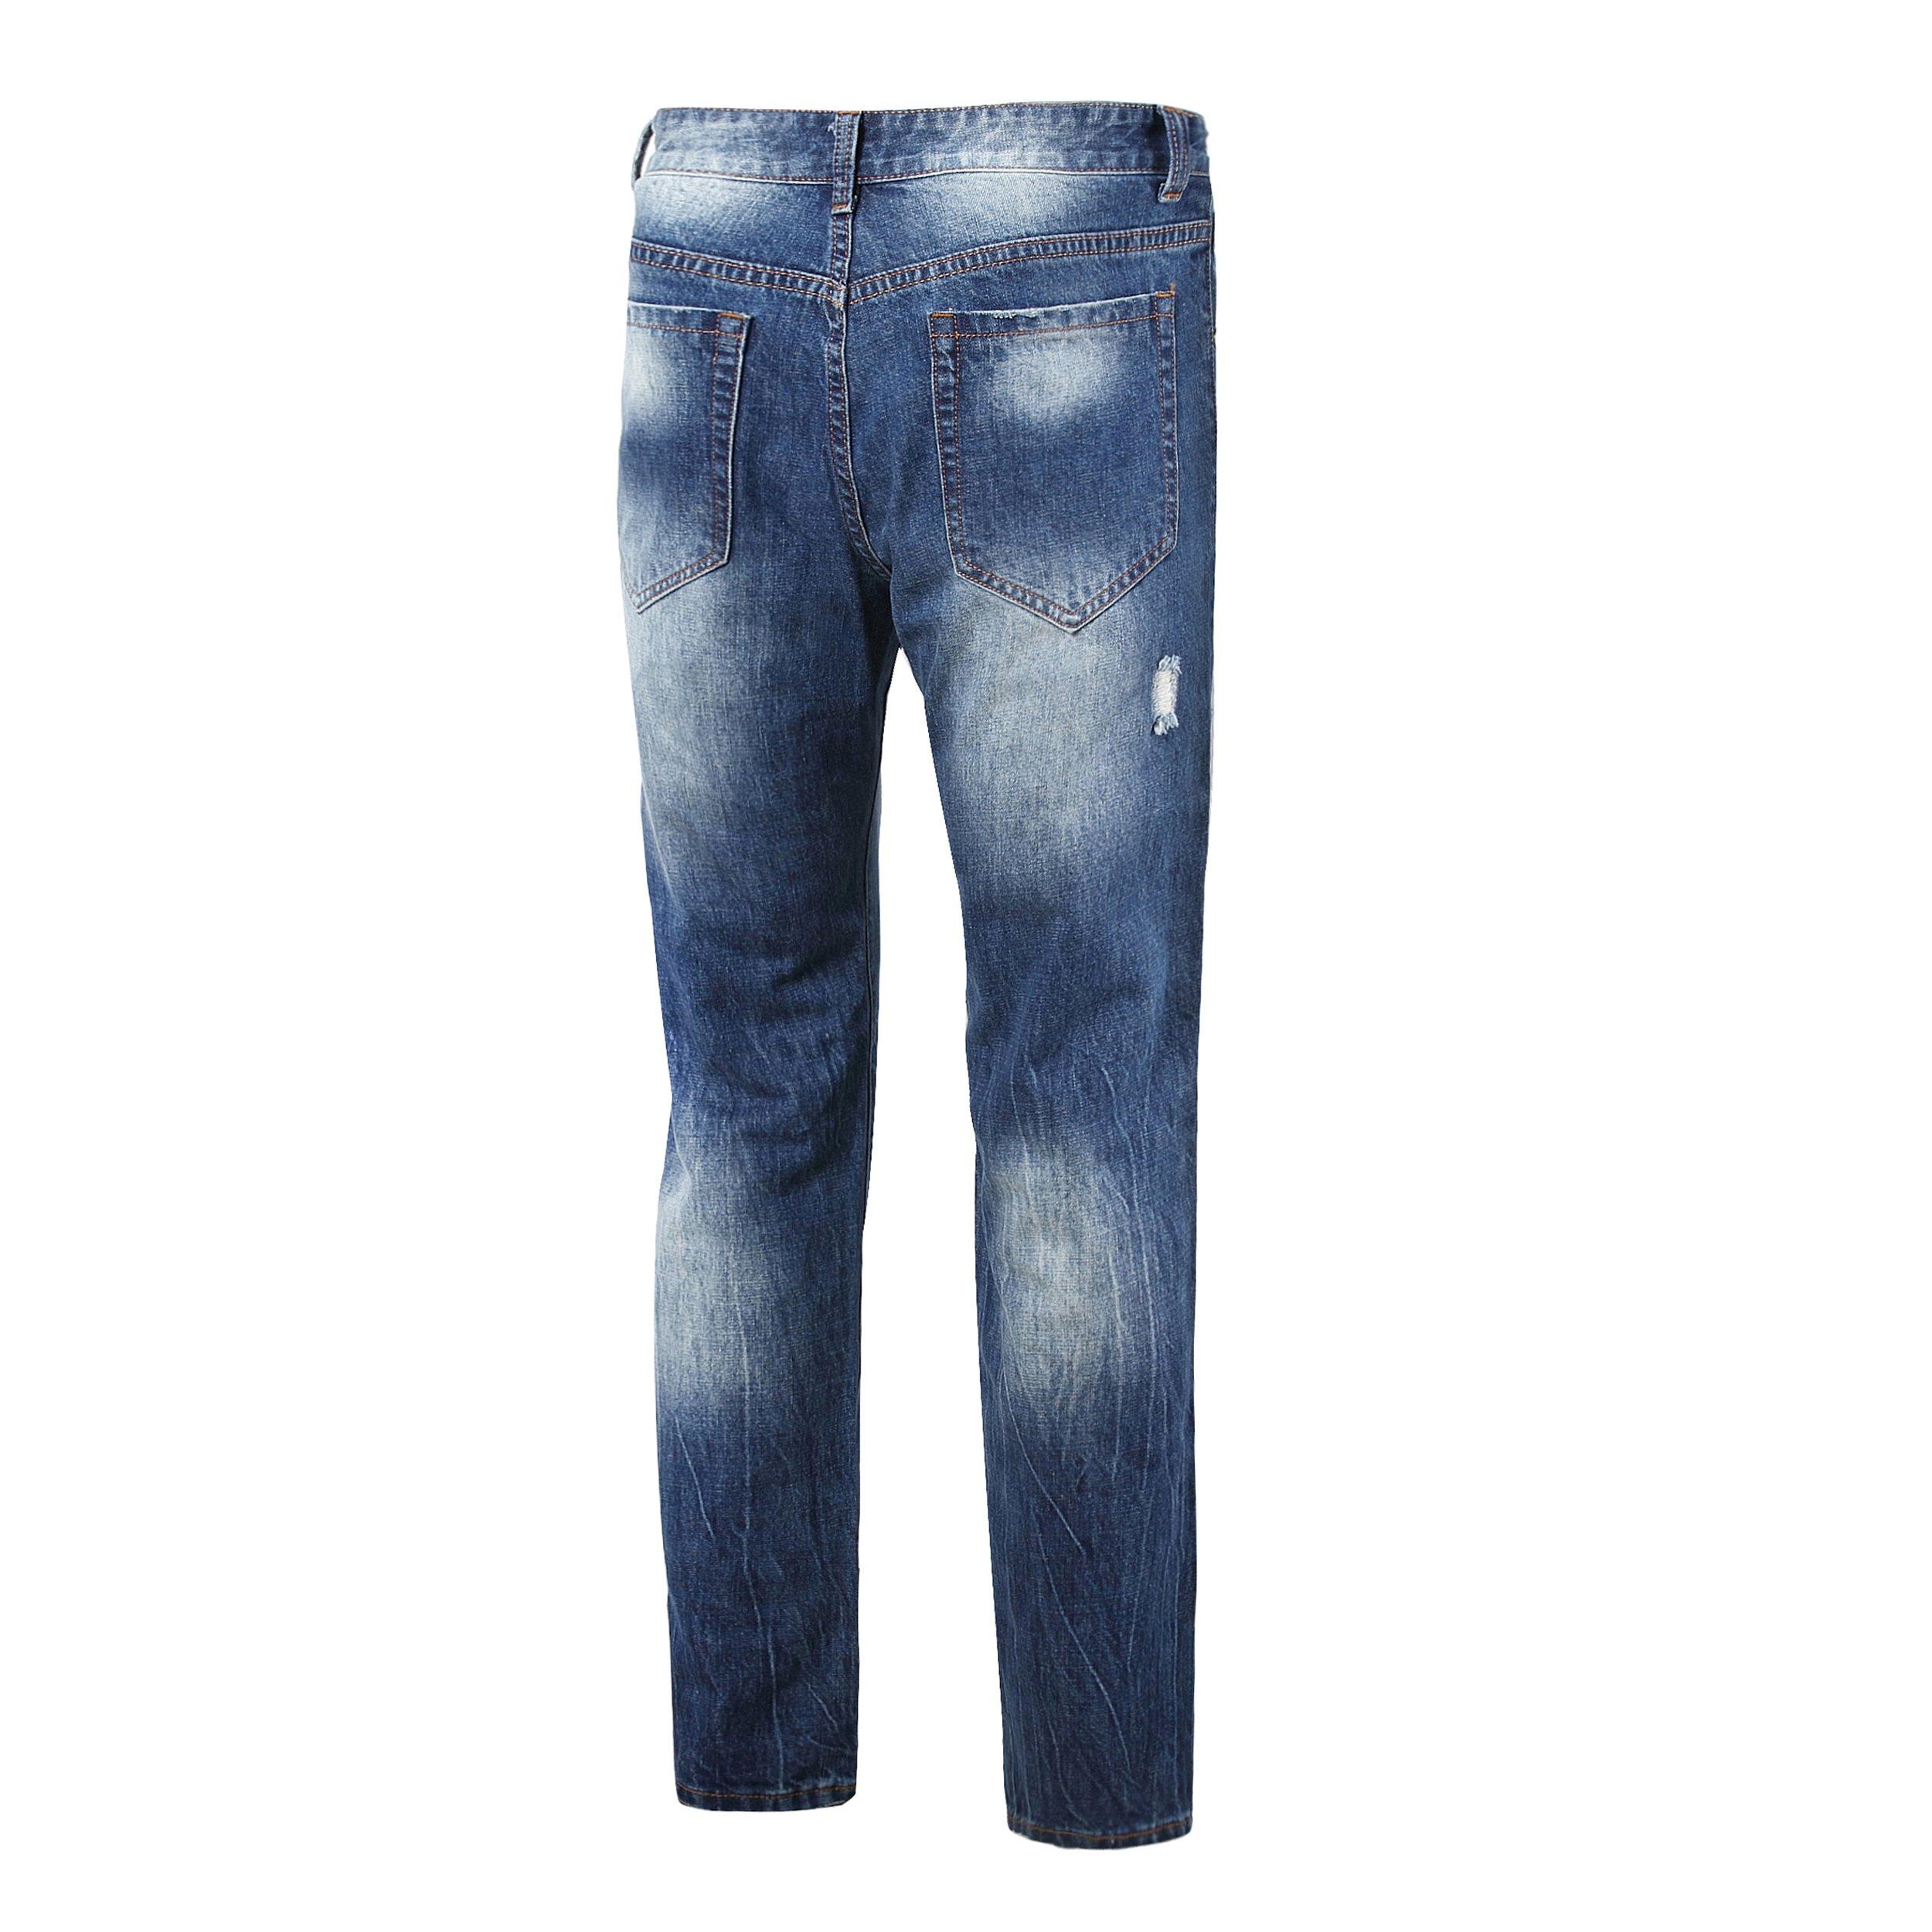 DAVID.ANN Men's Straight Fit Distressed Ripped Denim Jeans,Blue,32 by DAVID.ANN (Image #4)